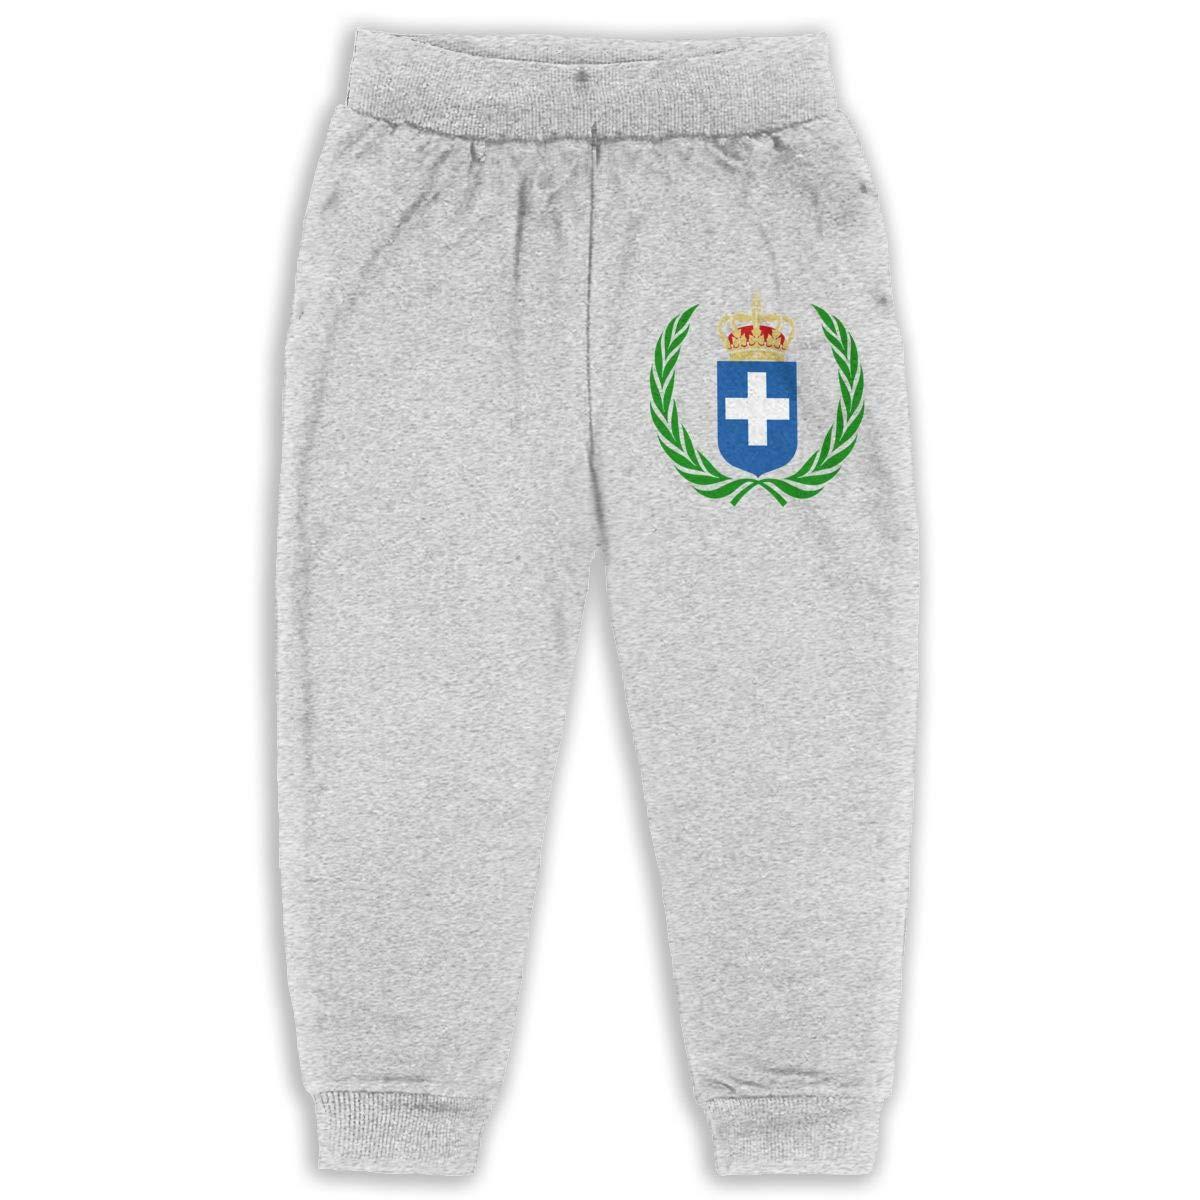 JOAPNWJ Coat of Arms Greece Children Cartoon Cotton Sweatpants Sport Jogger Elastic Pants